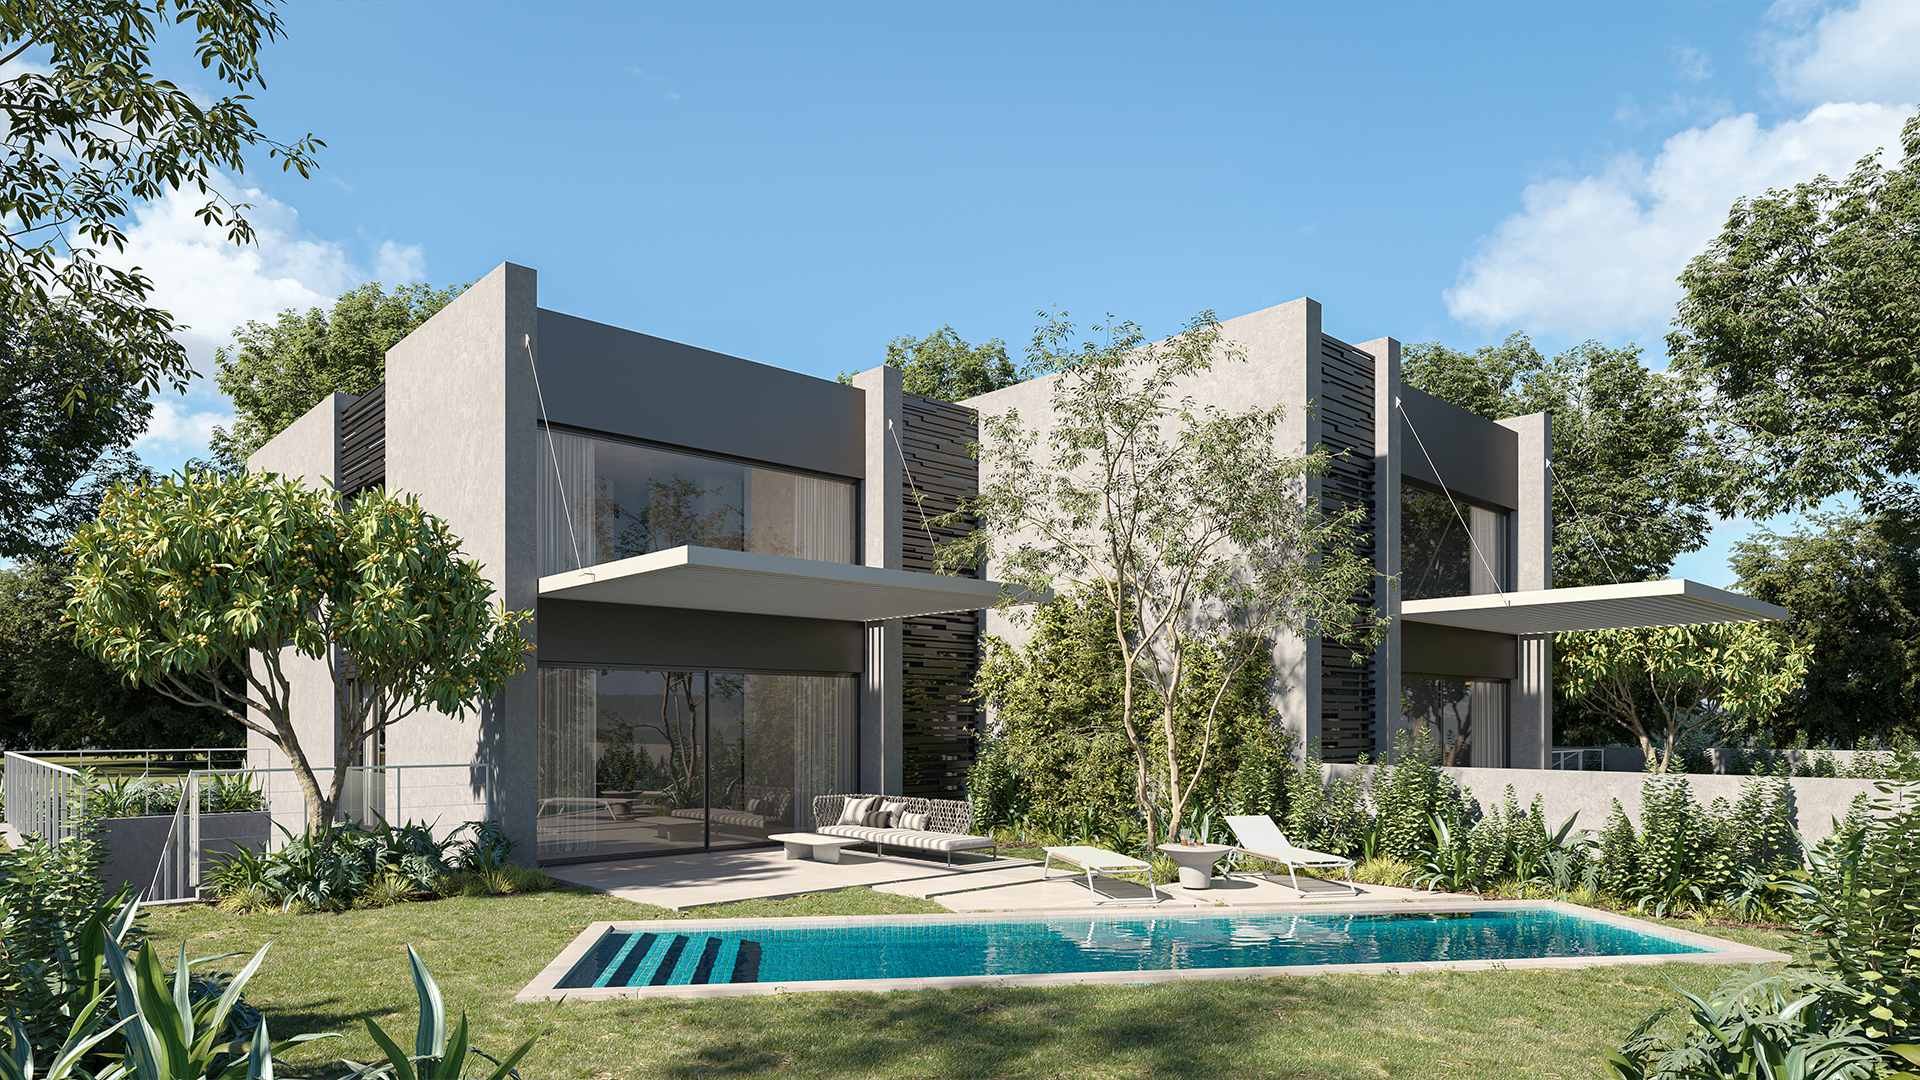 Maayan-Golan_Architectural-Visualization_exterior-visualization_back-elevation_haim-shorer-tel-aviv_architecture-sade-dagan_02